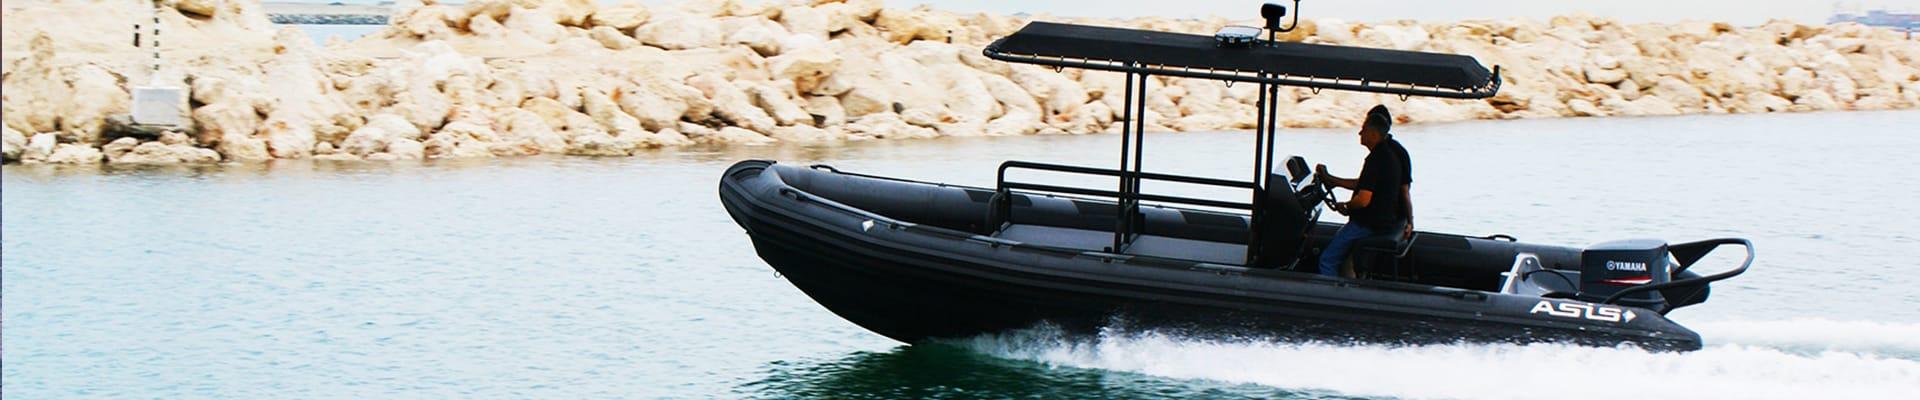 Rib-Boat-Anti-Piracy-8-m